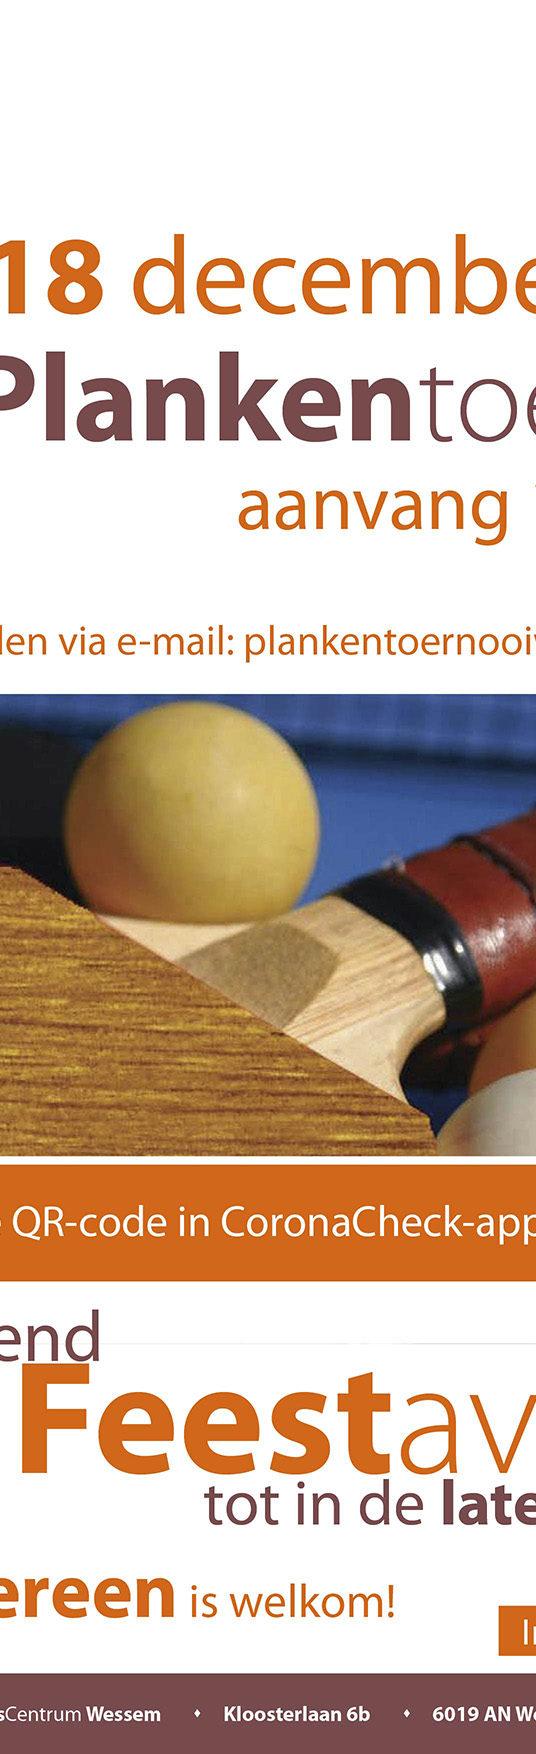 Plankentoernooi 2021. Save the date!